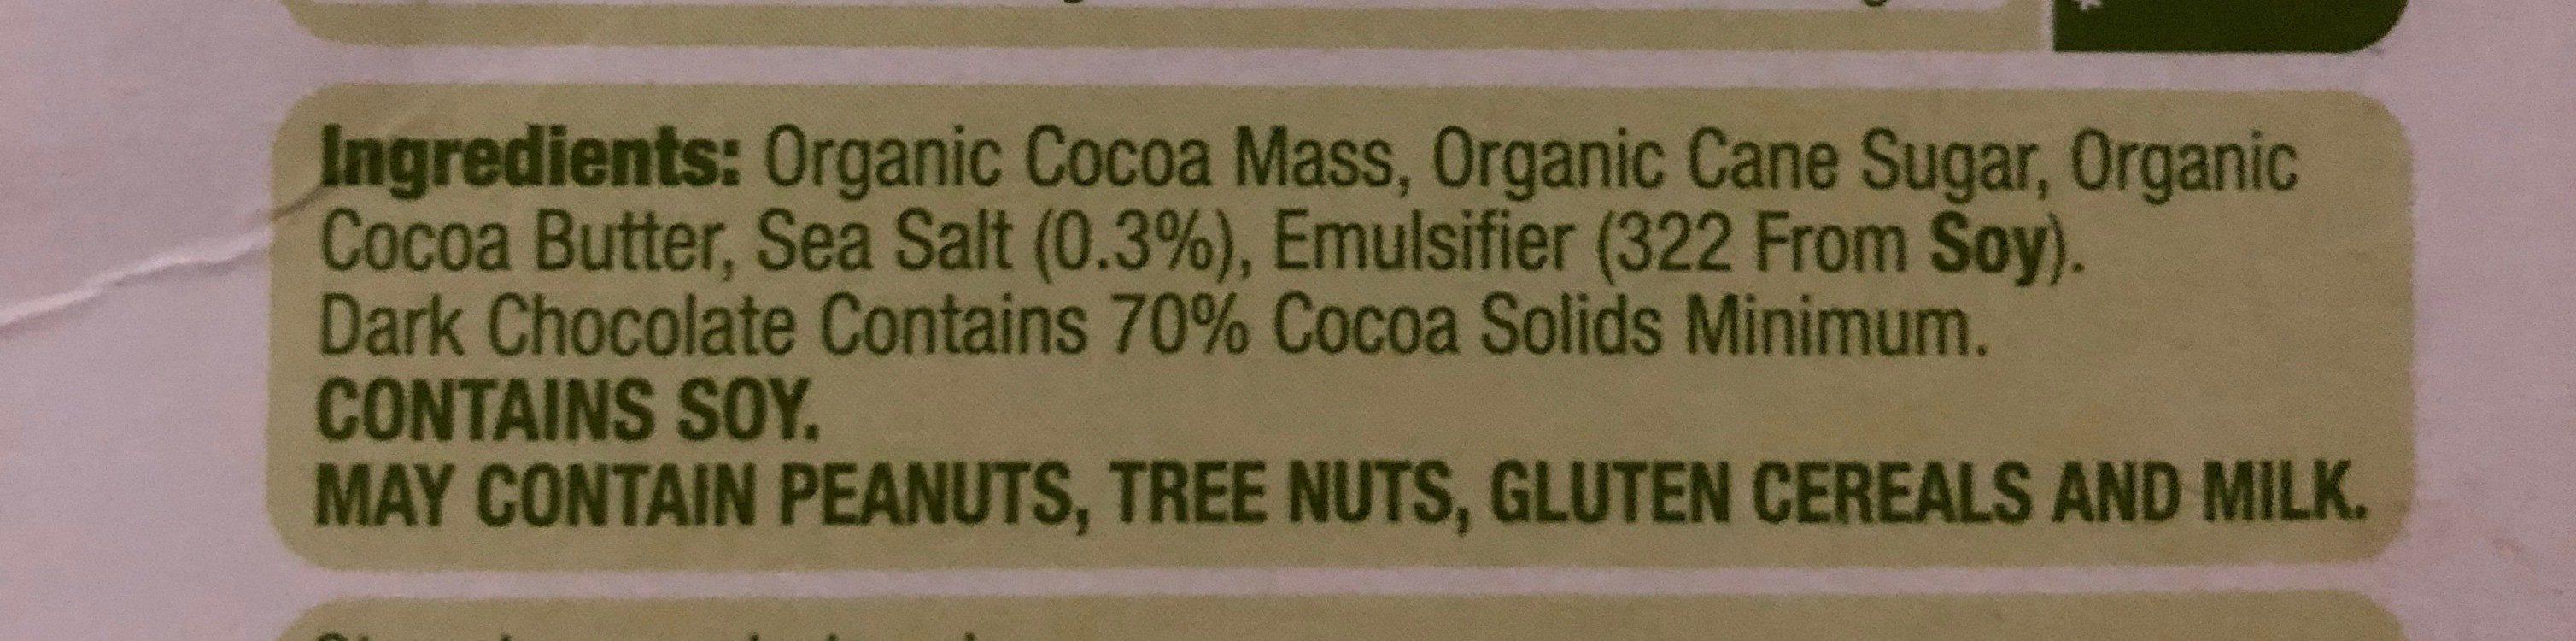 Organic dark - Ingredients